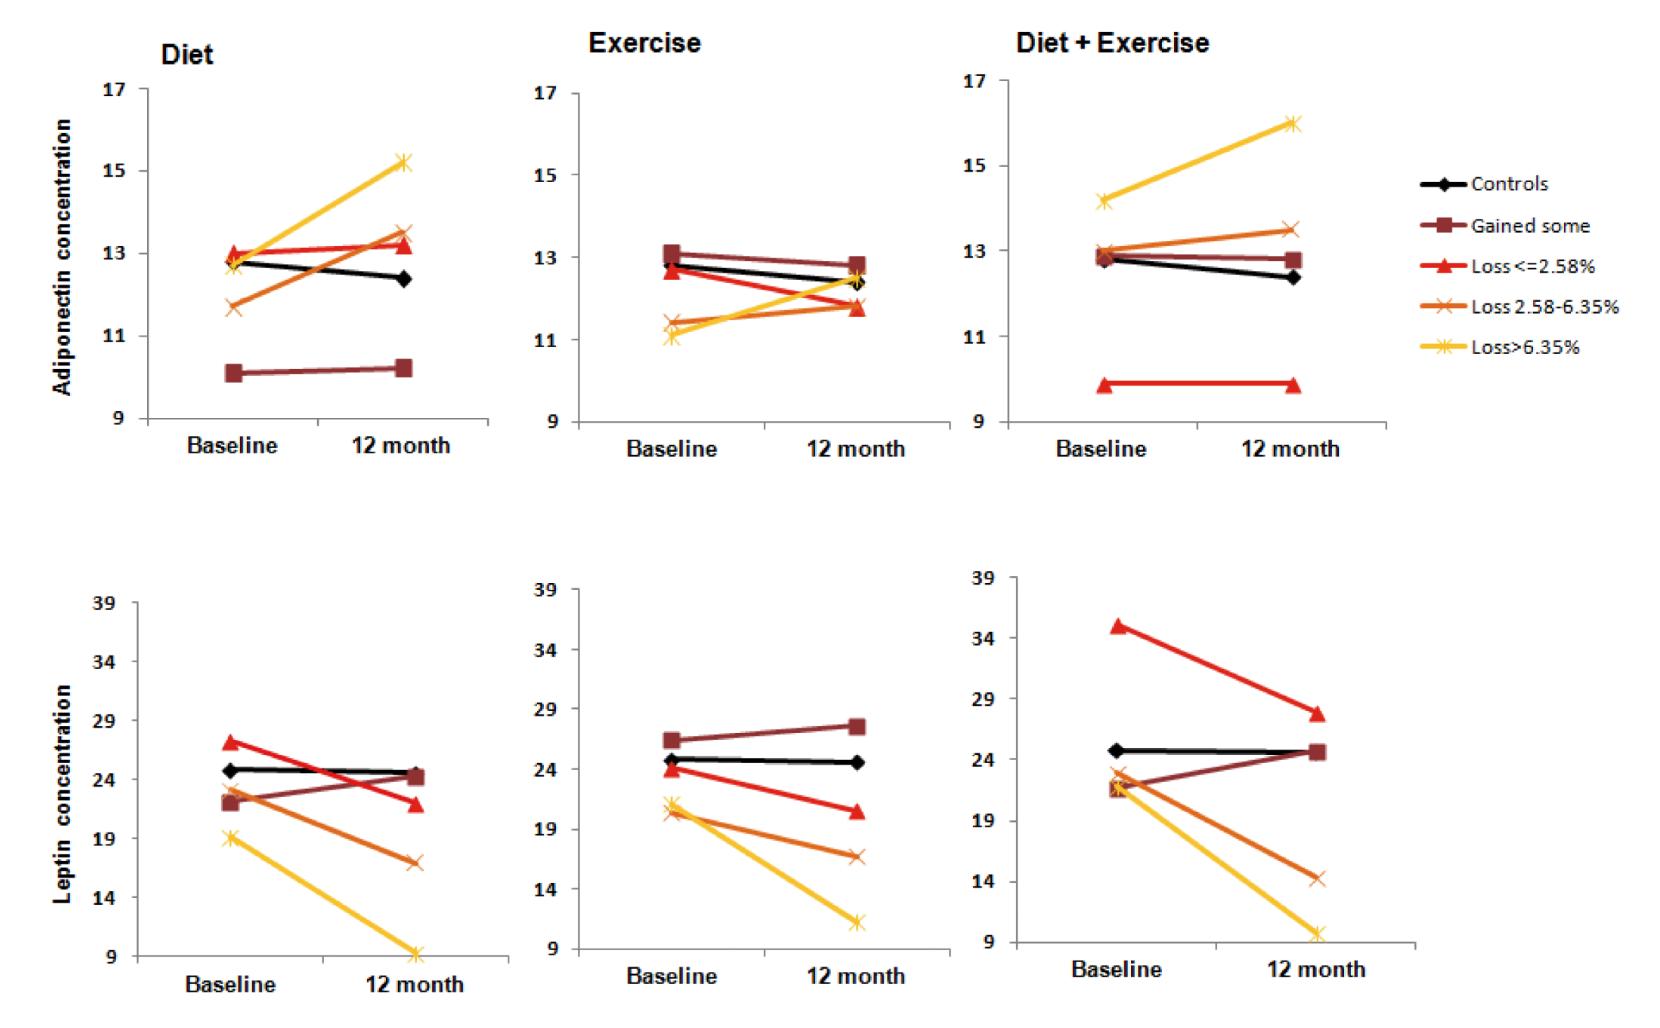 fissac _ leptina y ejercicio + dieta